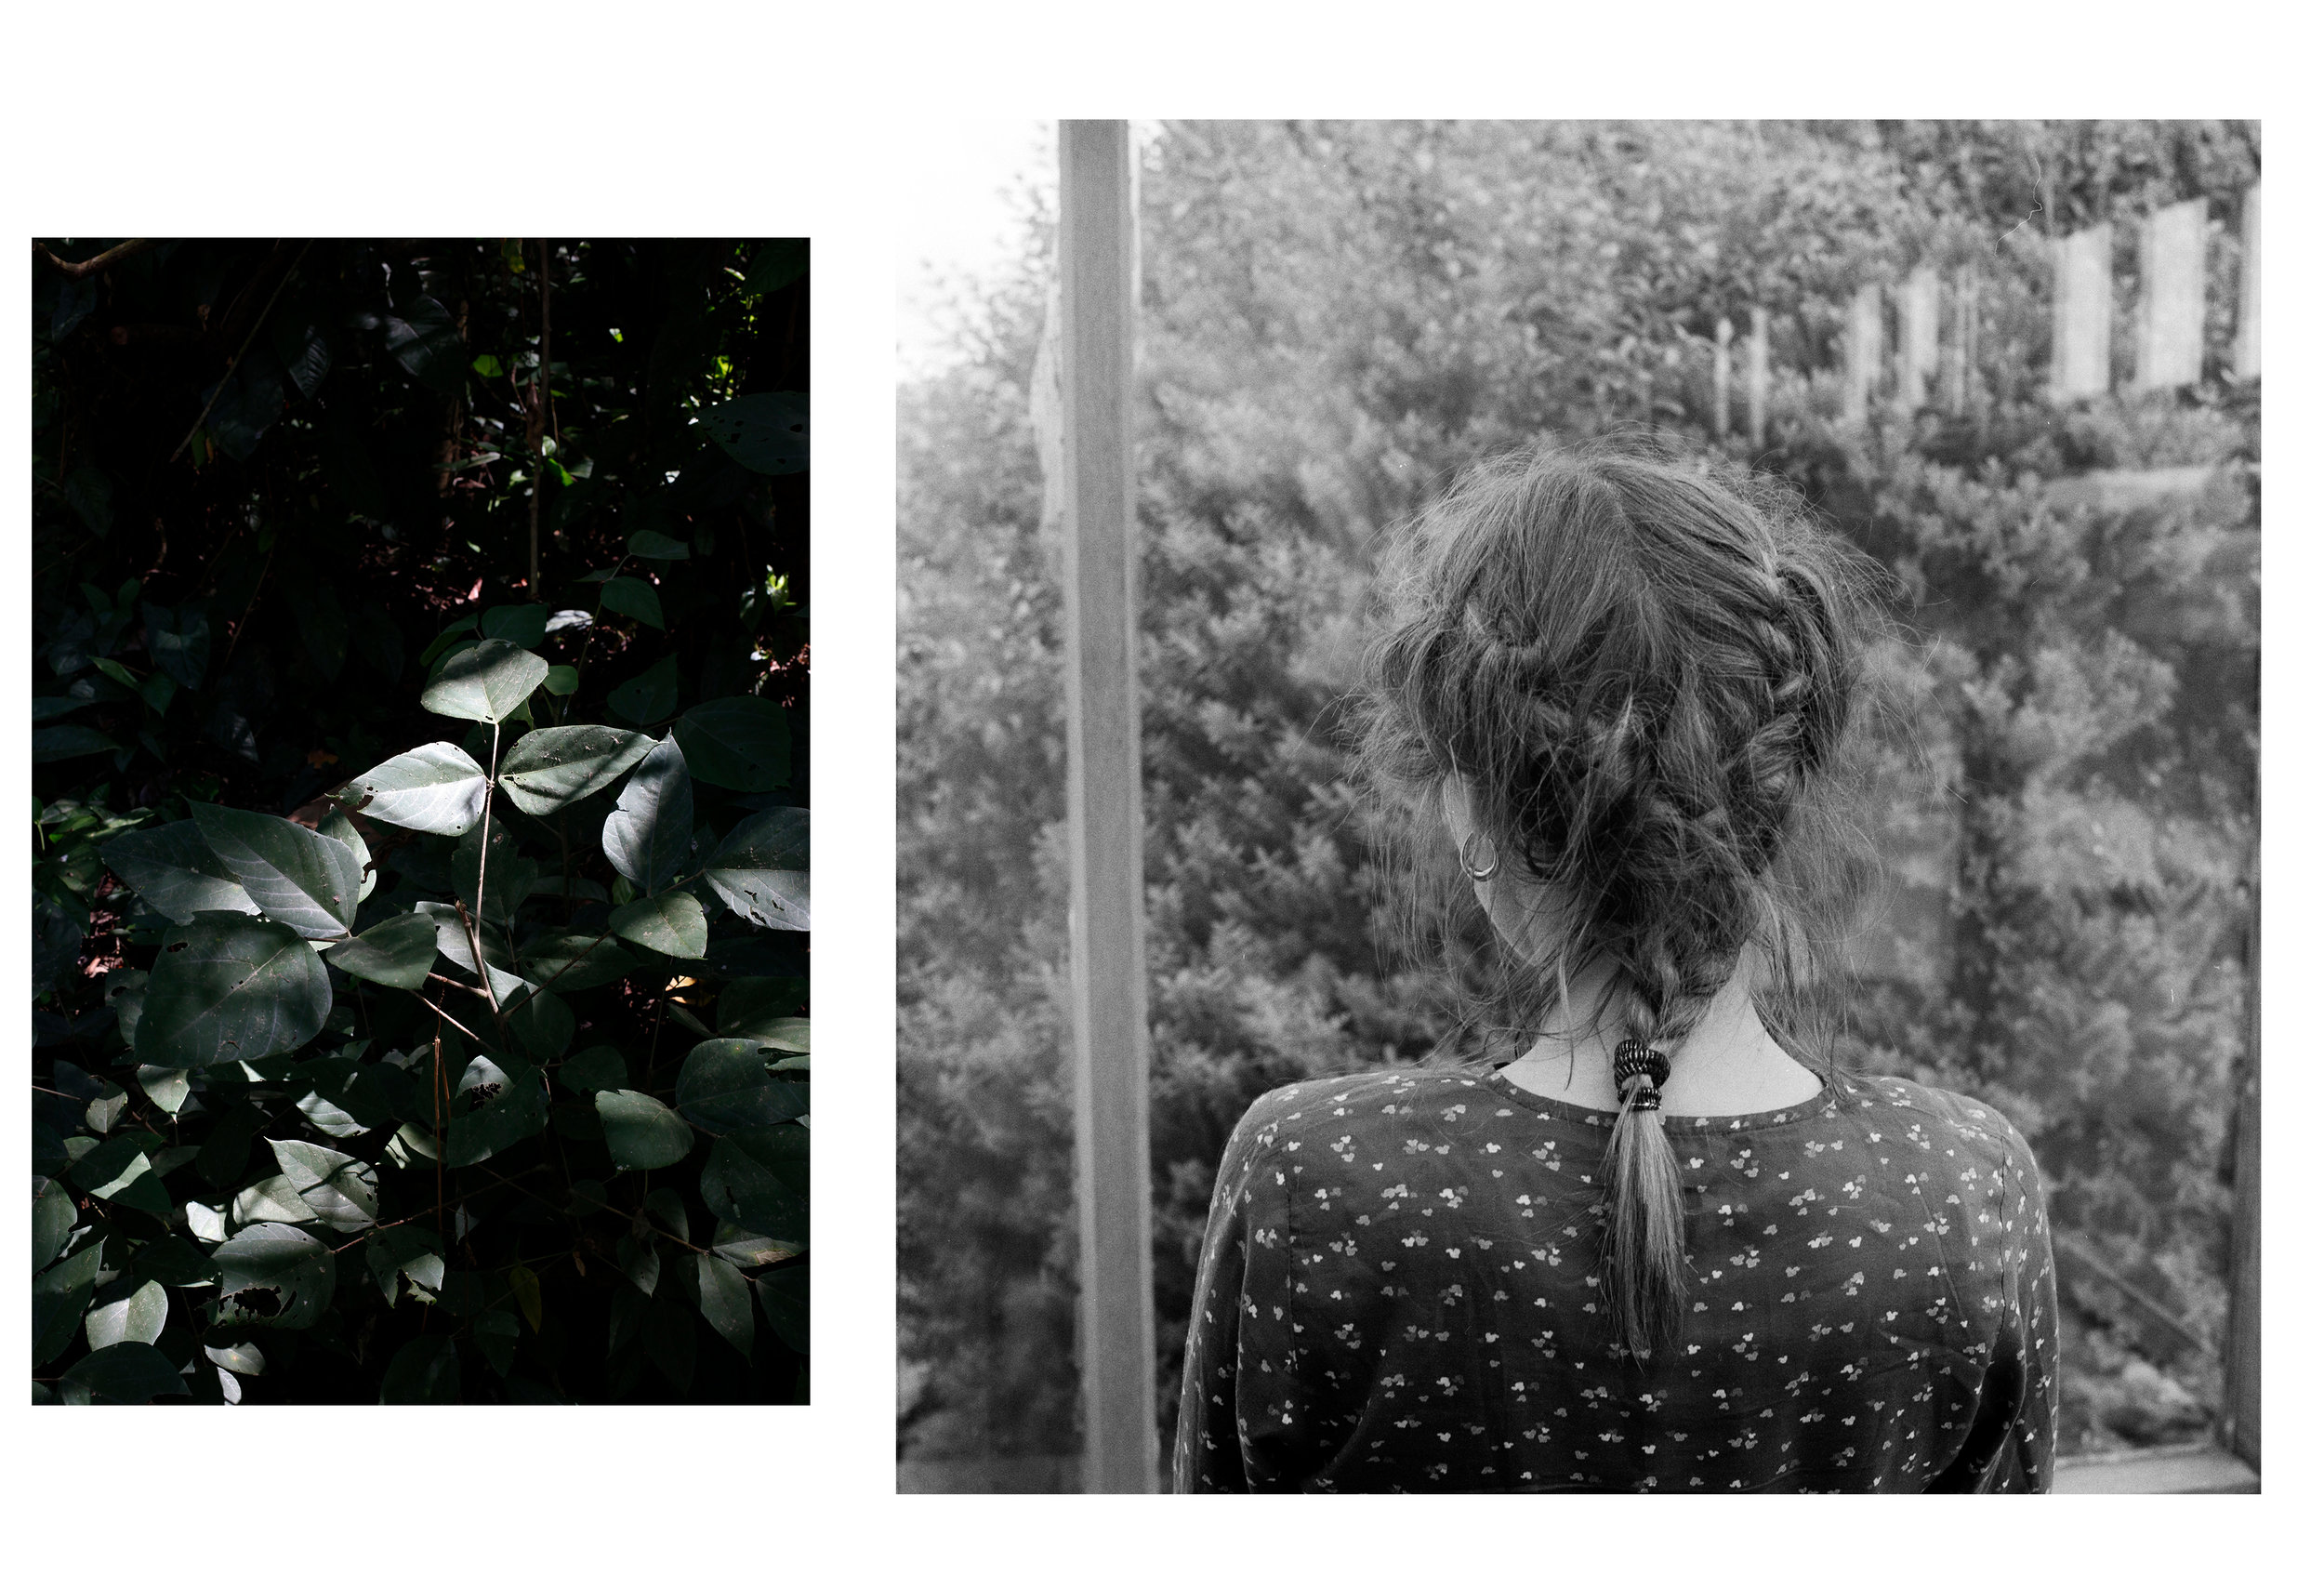 fragments2_03.jpg